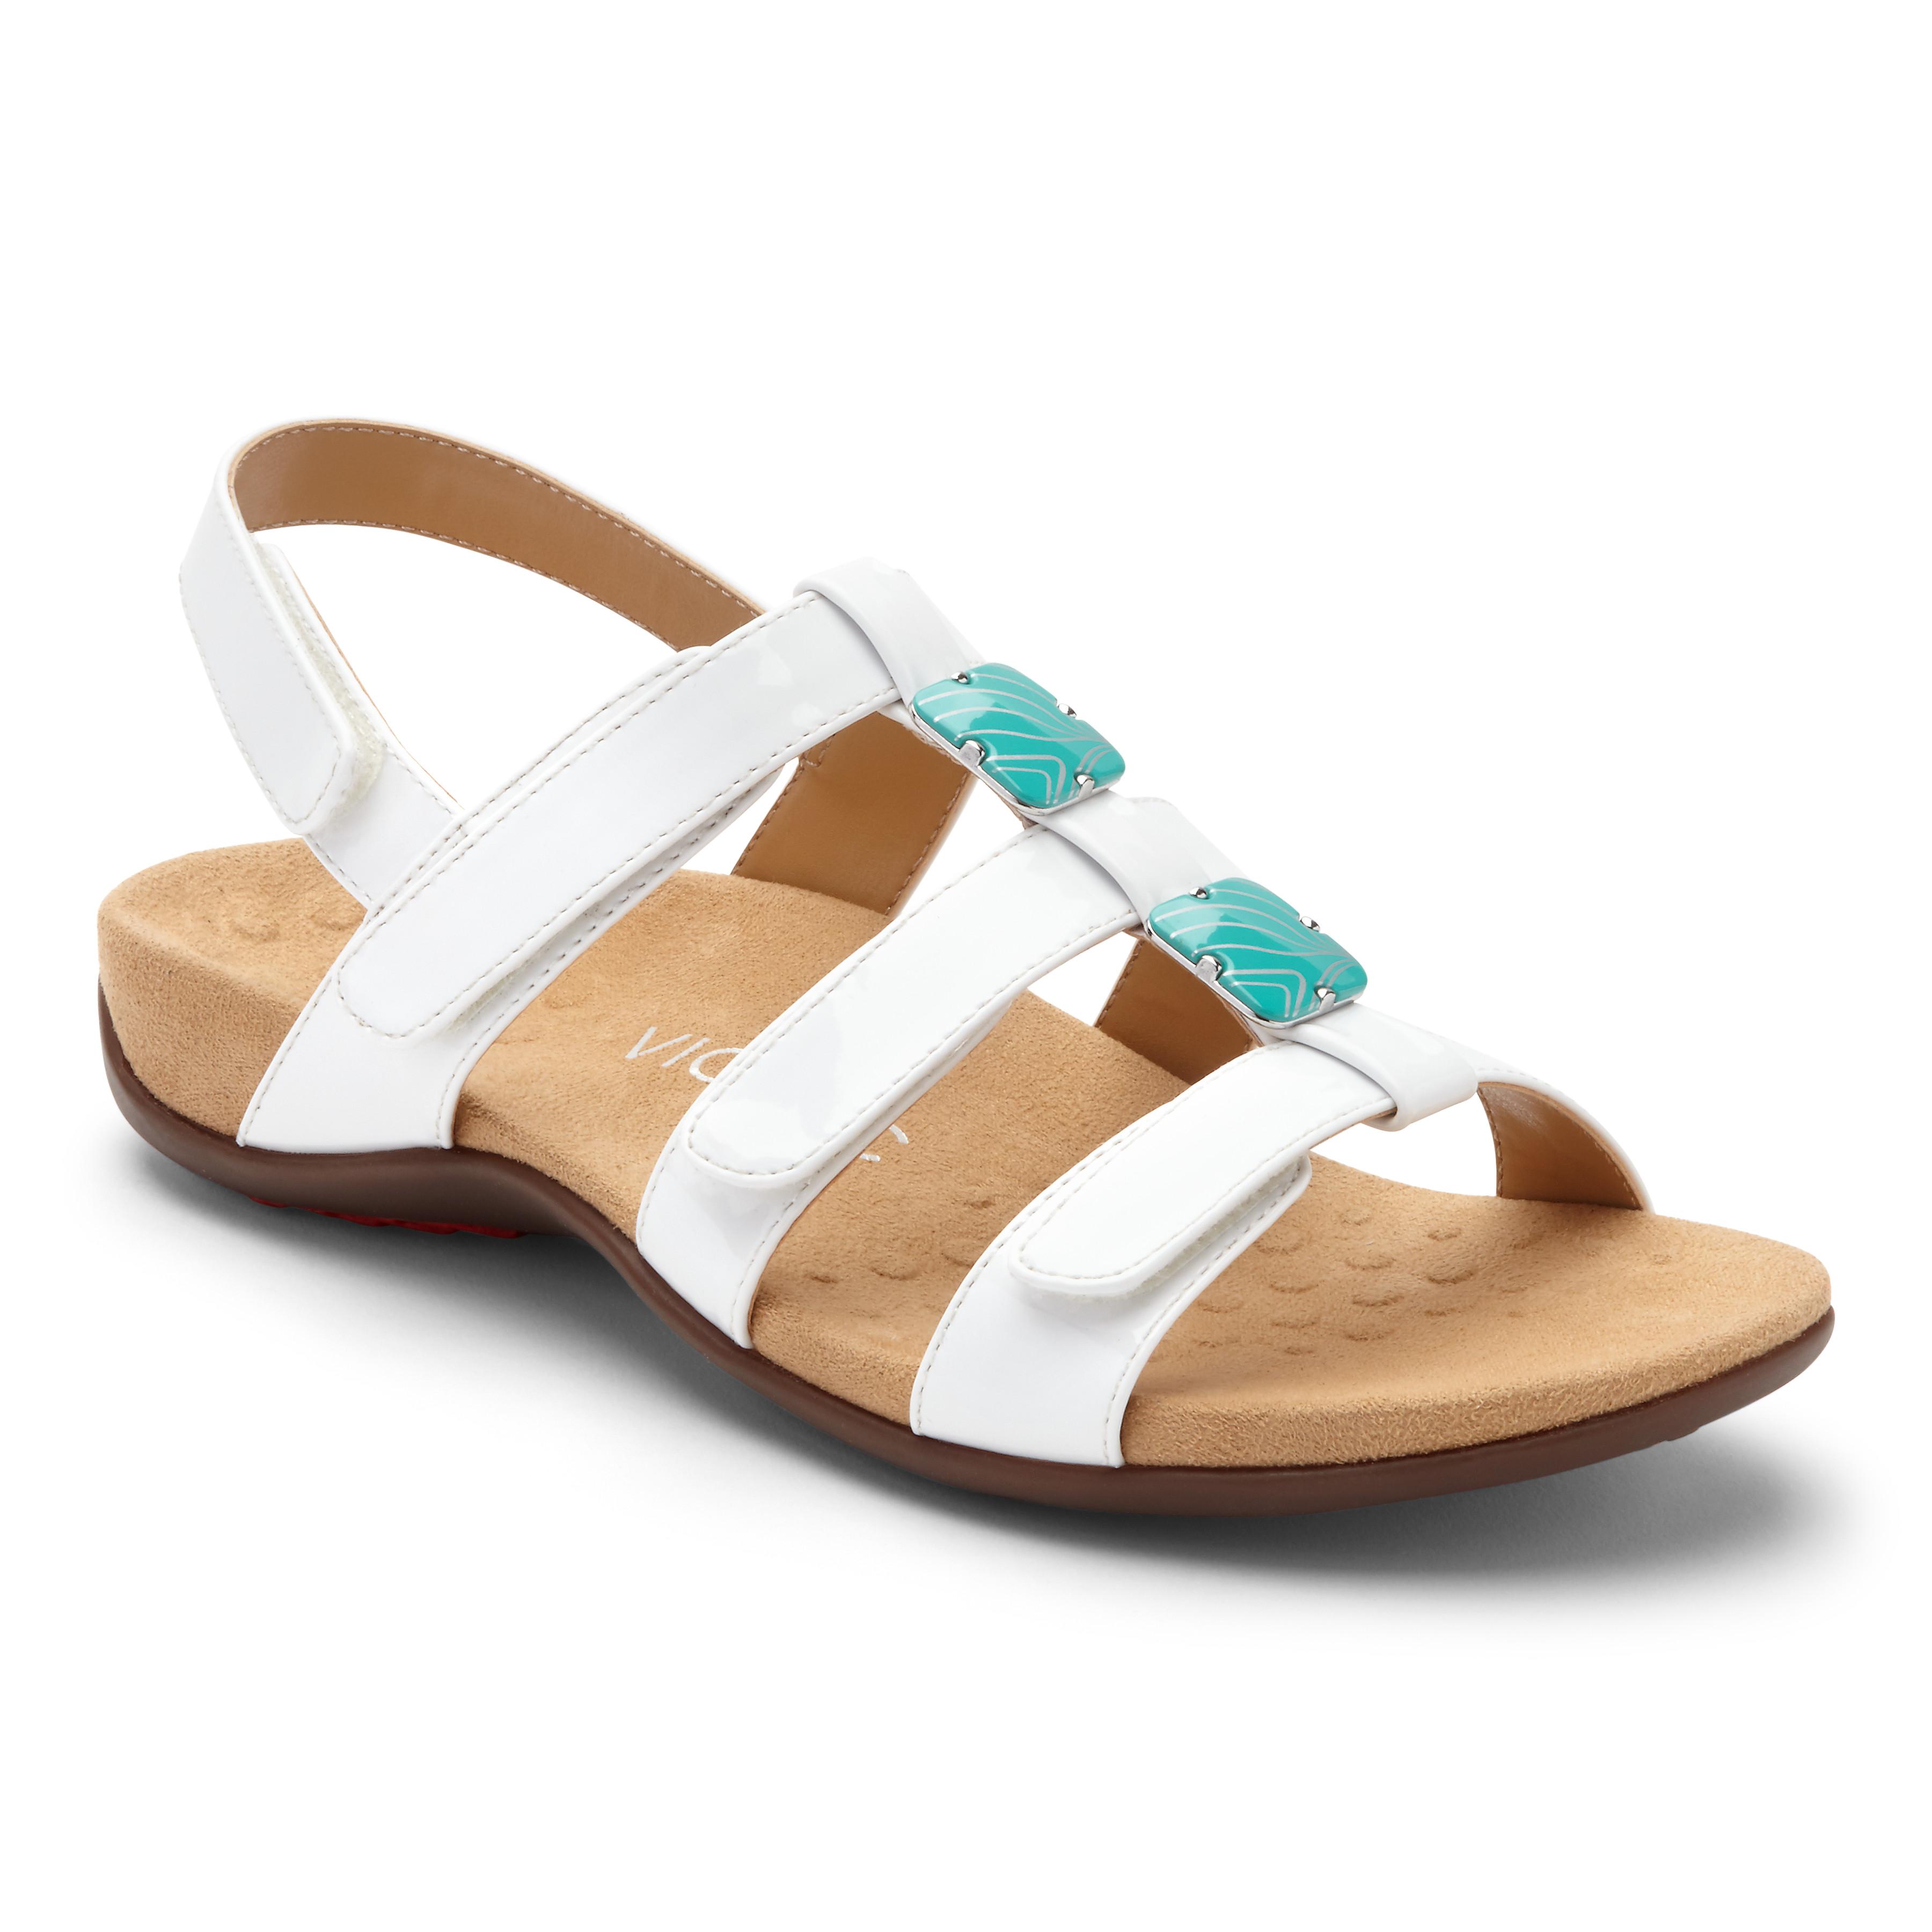 68964479a3bc Vionic Women s Rest Amber Sandal White Patent